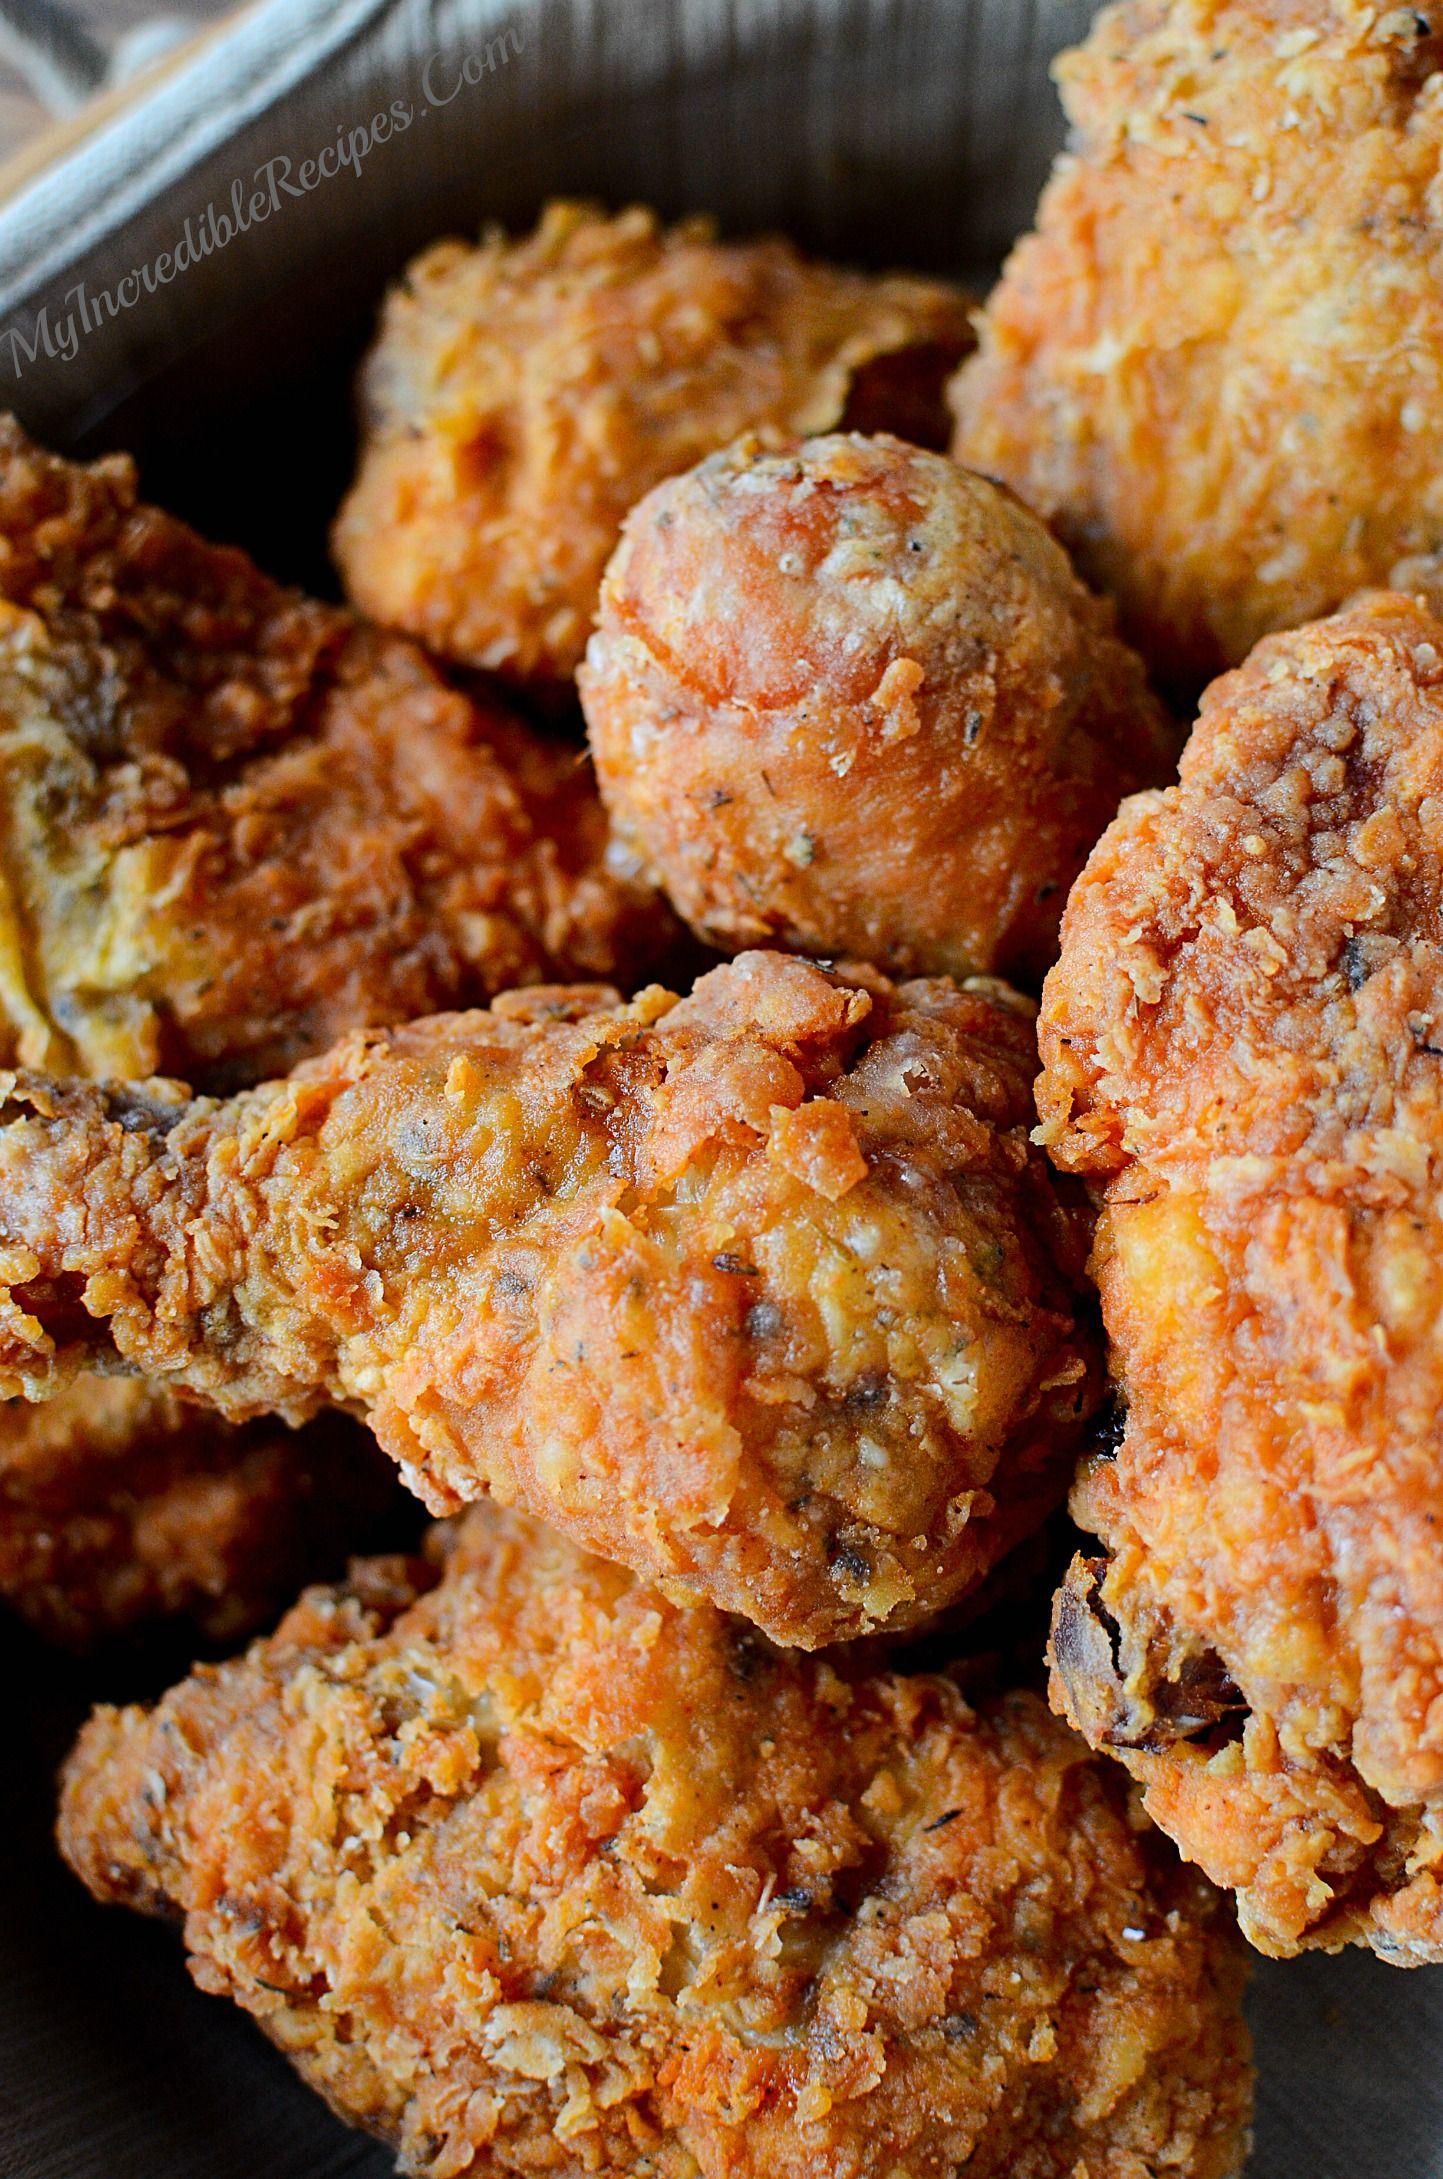 Southern Kfc Secret Fried Chicken Recipe Recipe Fried Chicken Recipes Recipes Chicken Recipes